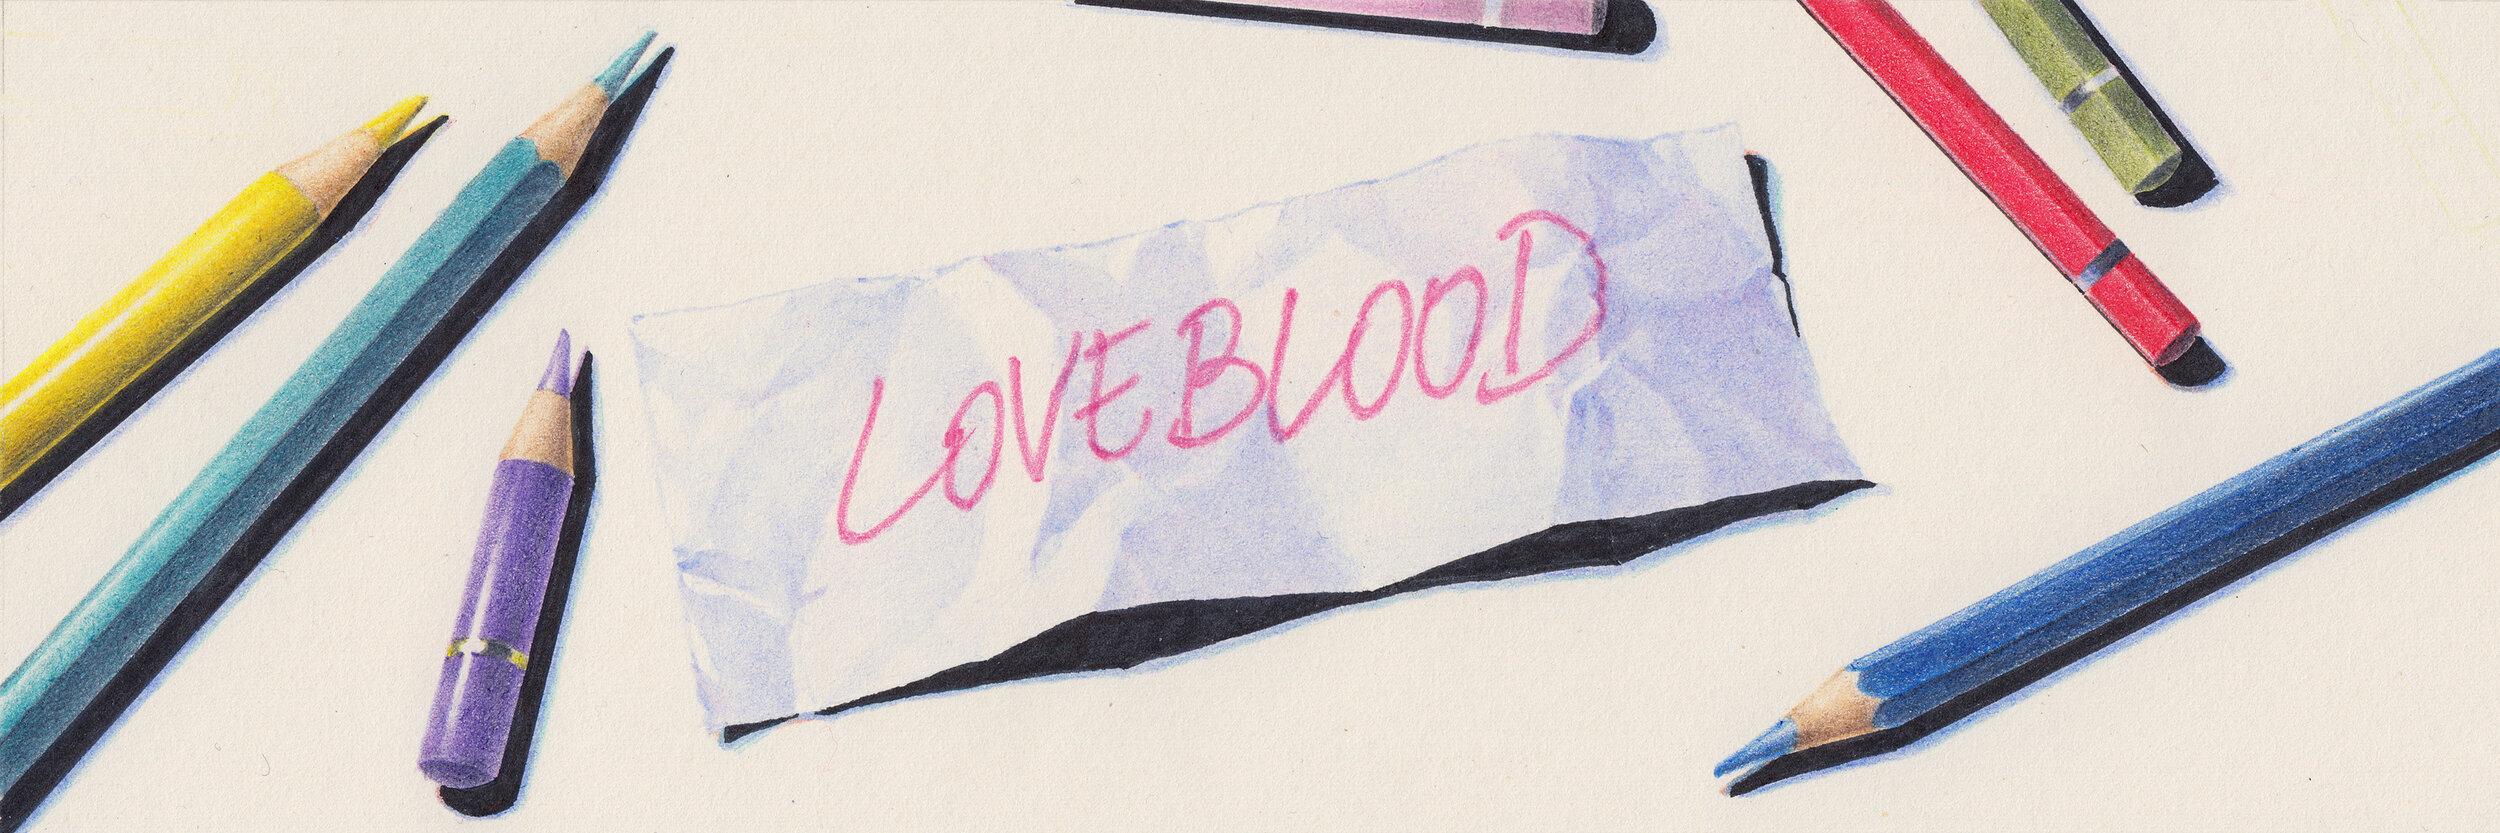 Loveblood Logo.jpg